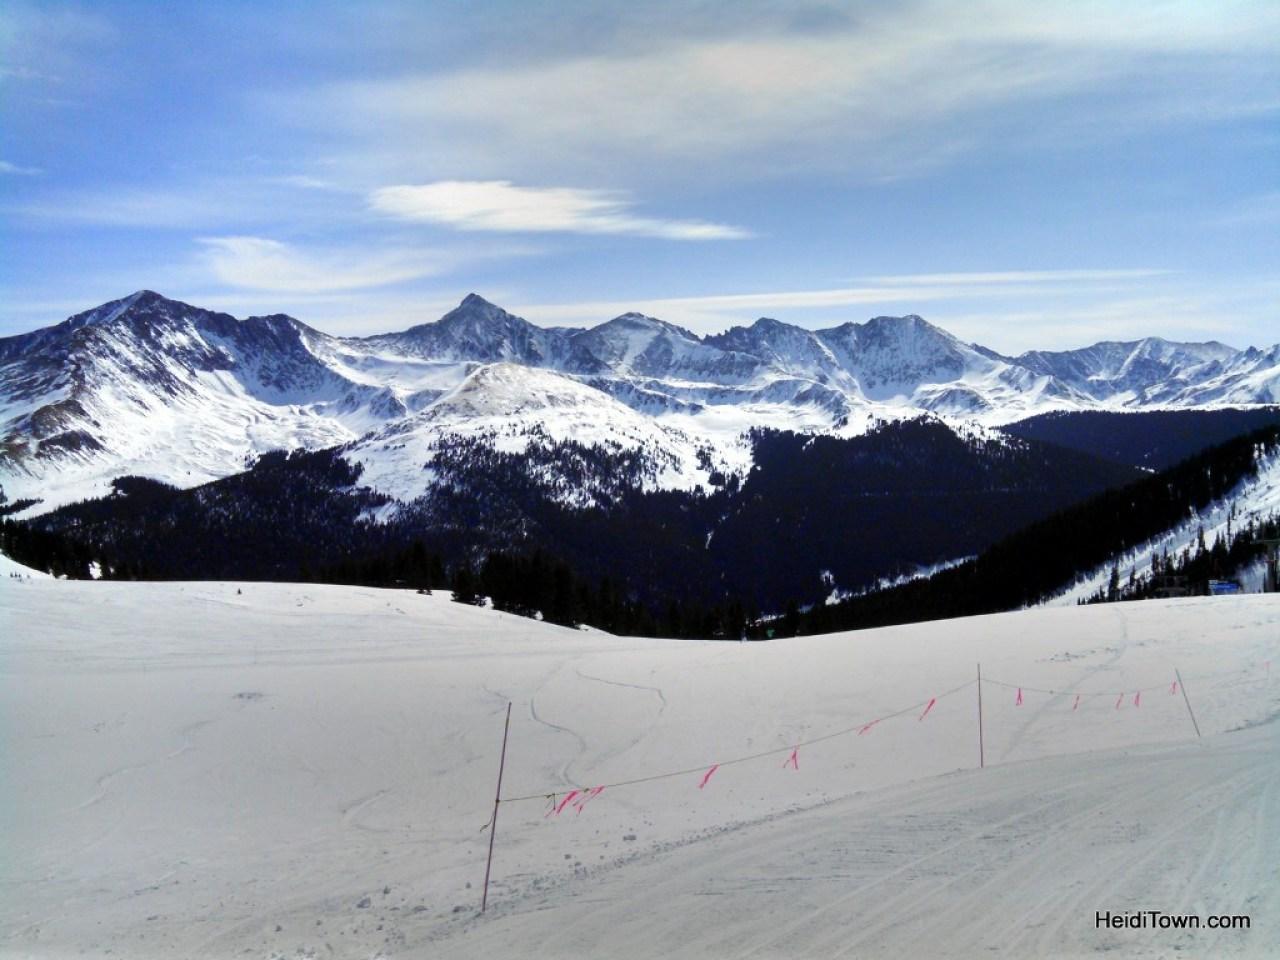 skiing Coper Mountain. HeidiTown.com